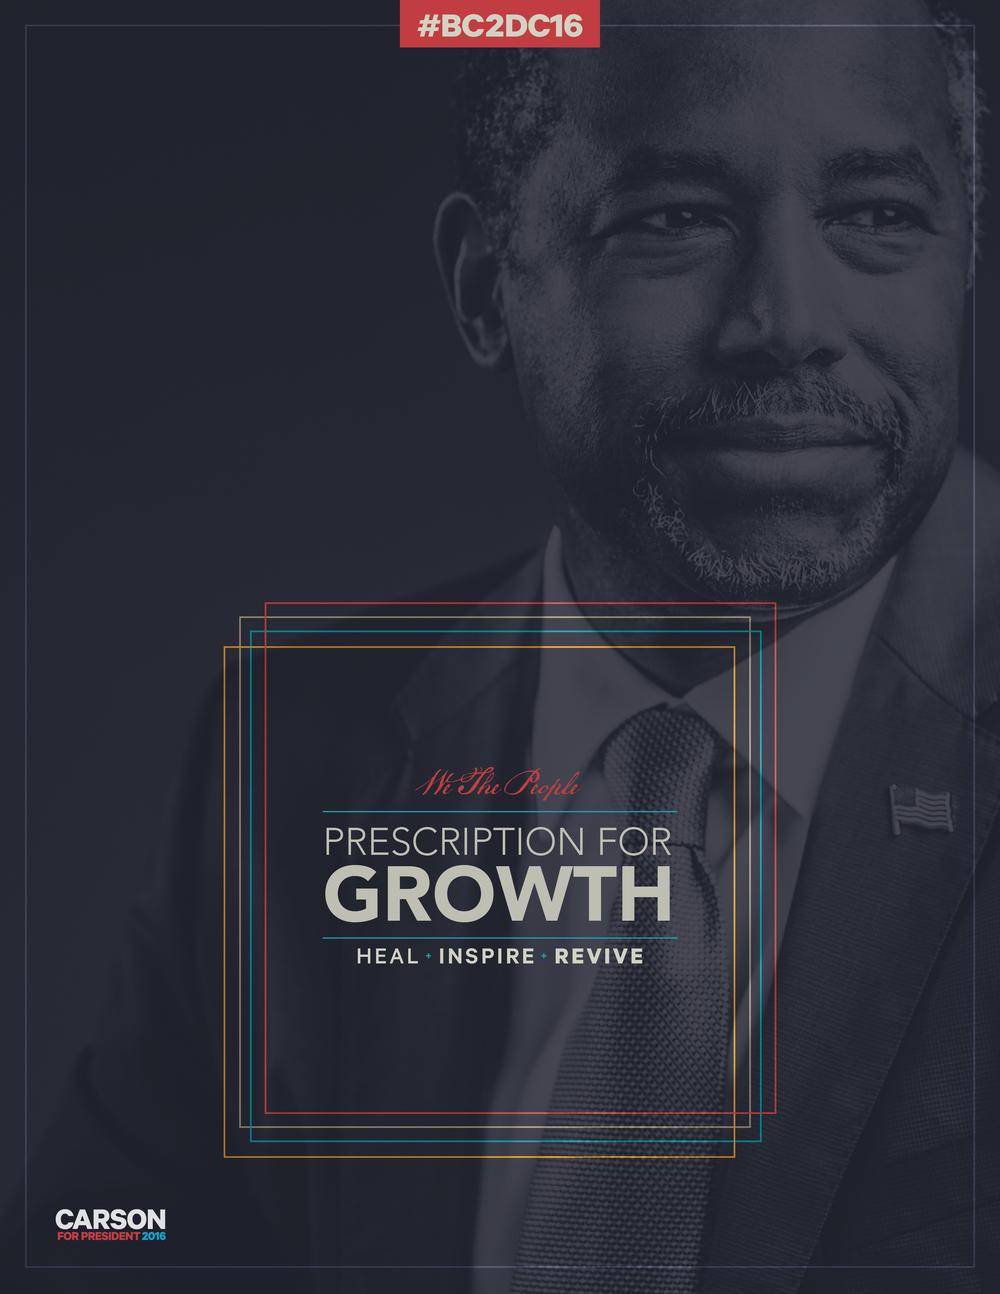 20160104_Prescription for Growth_posts_c.jpg